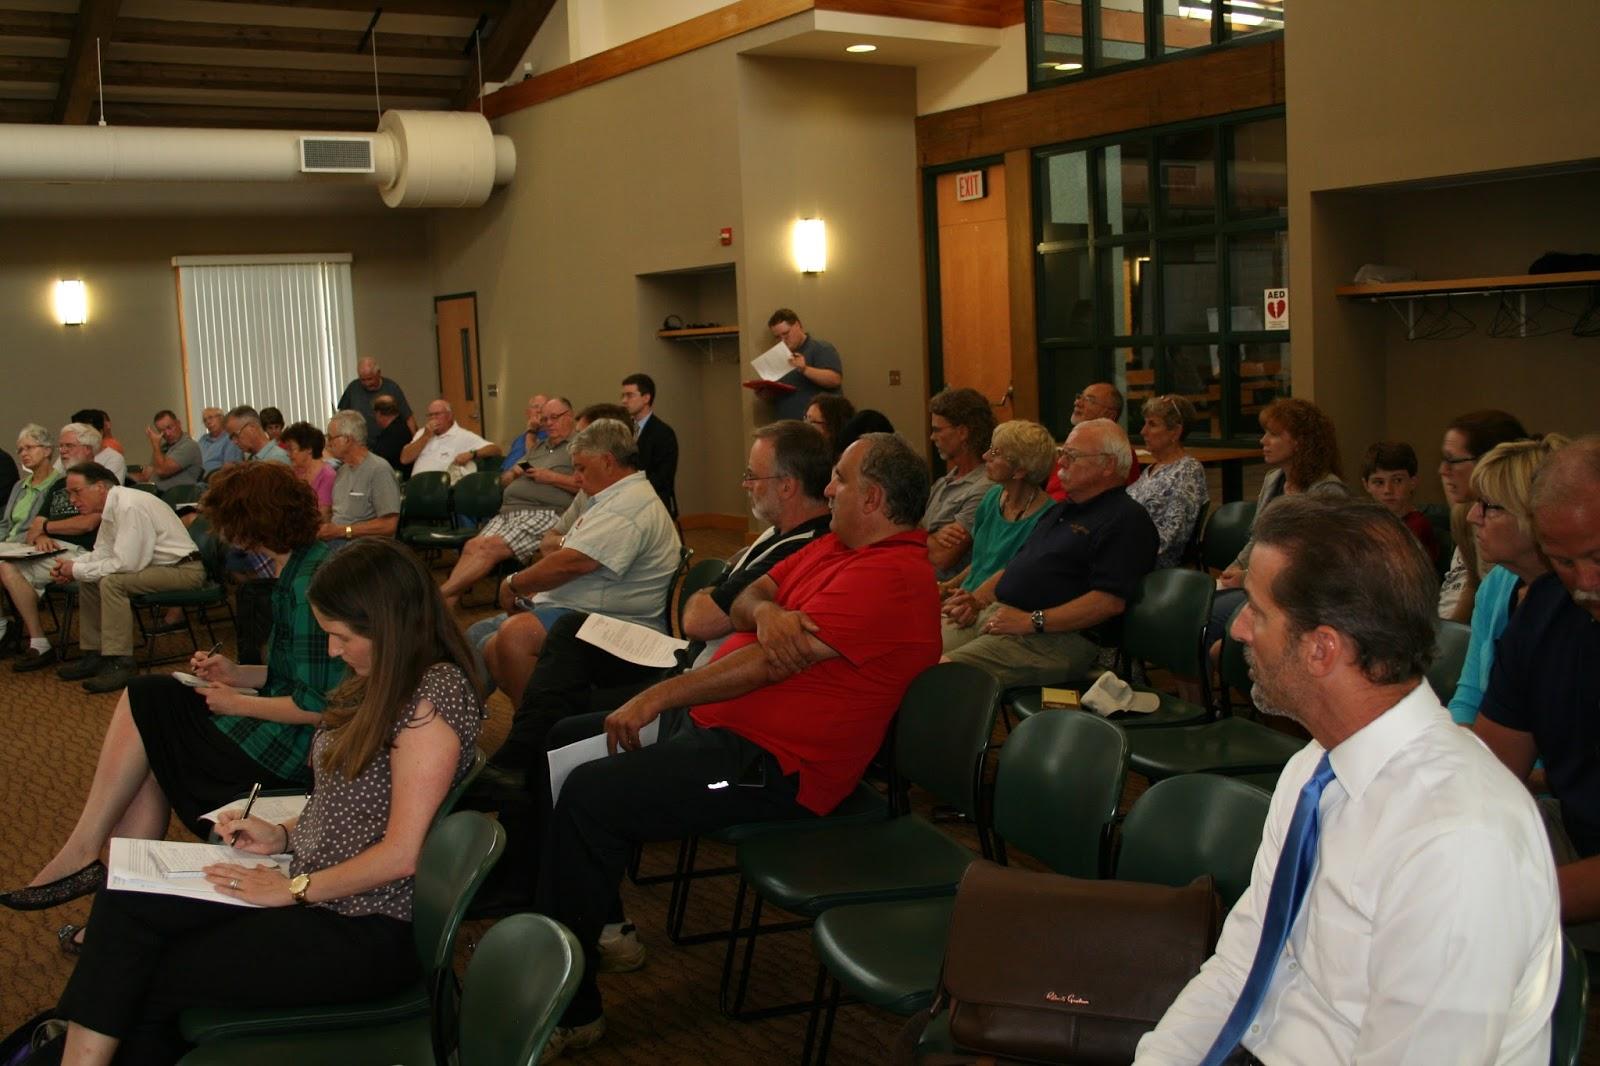 Lehigh Valley Meeting Rooms Cheap